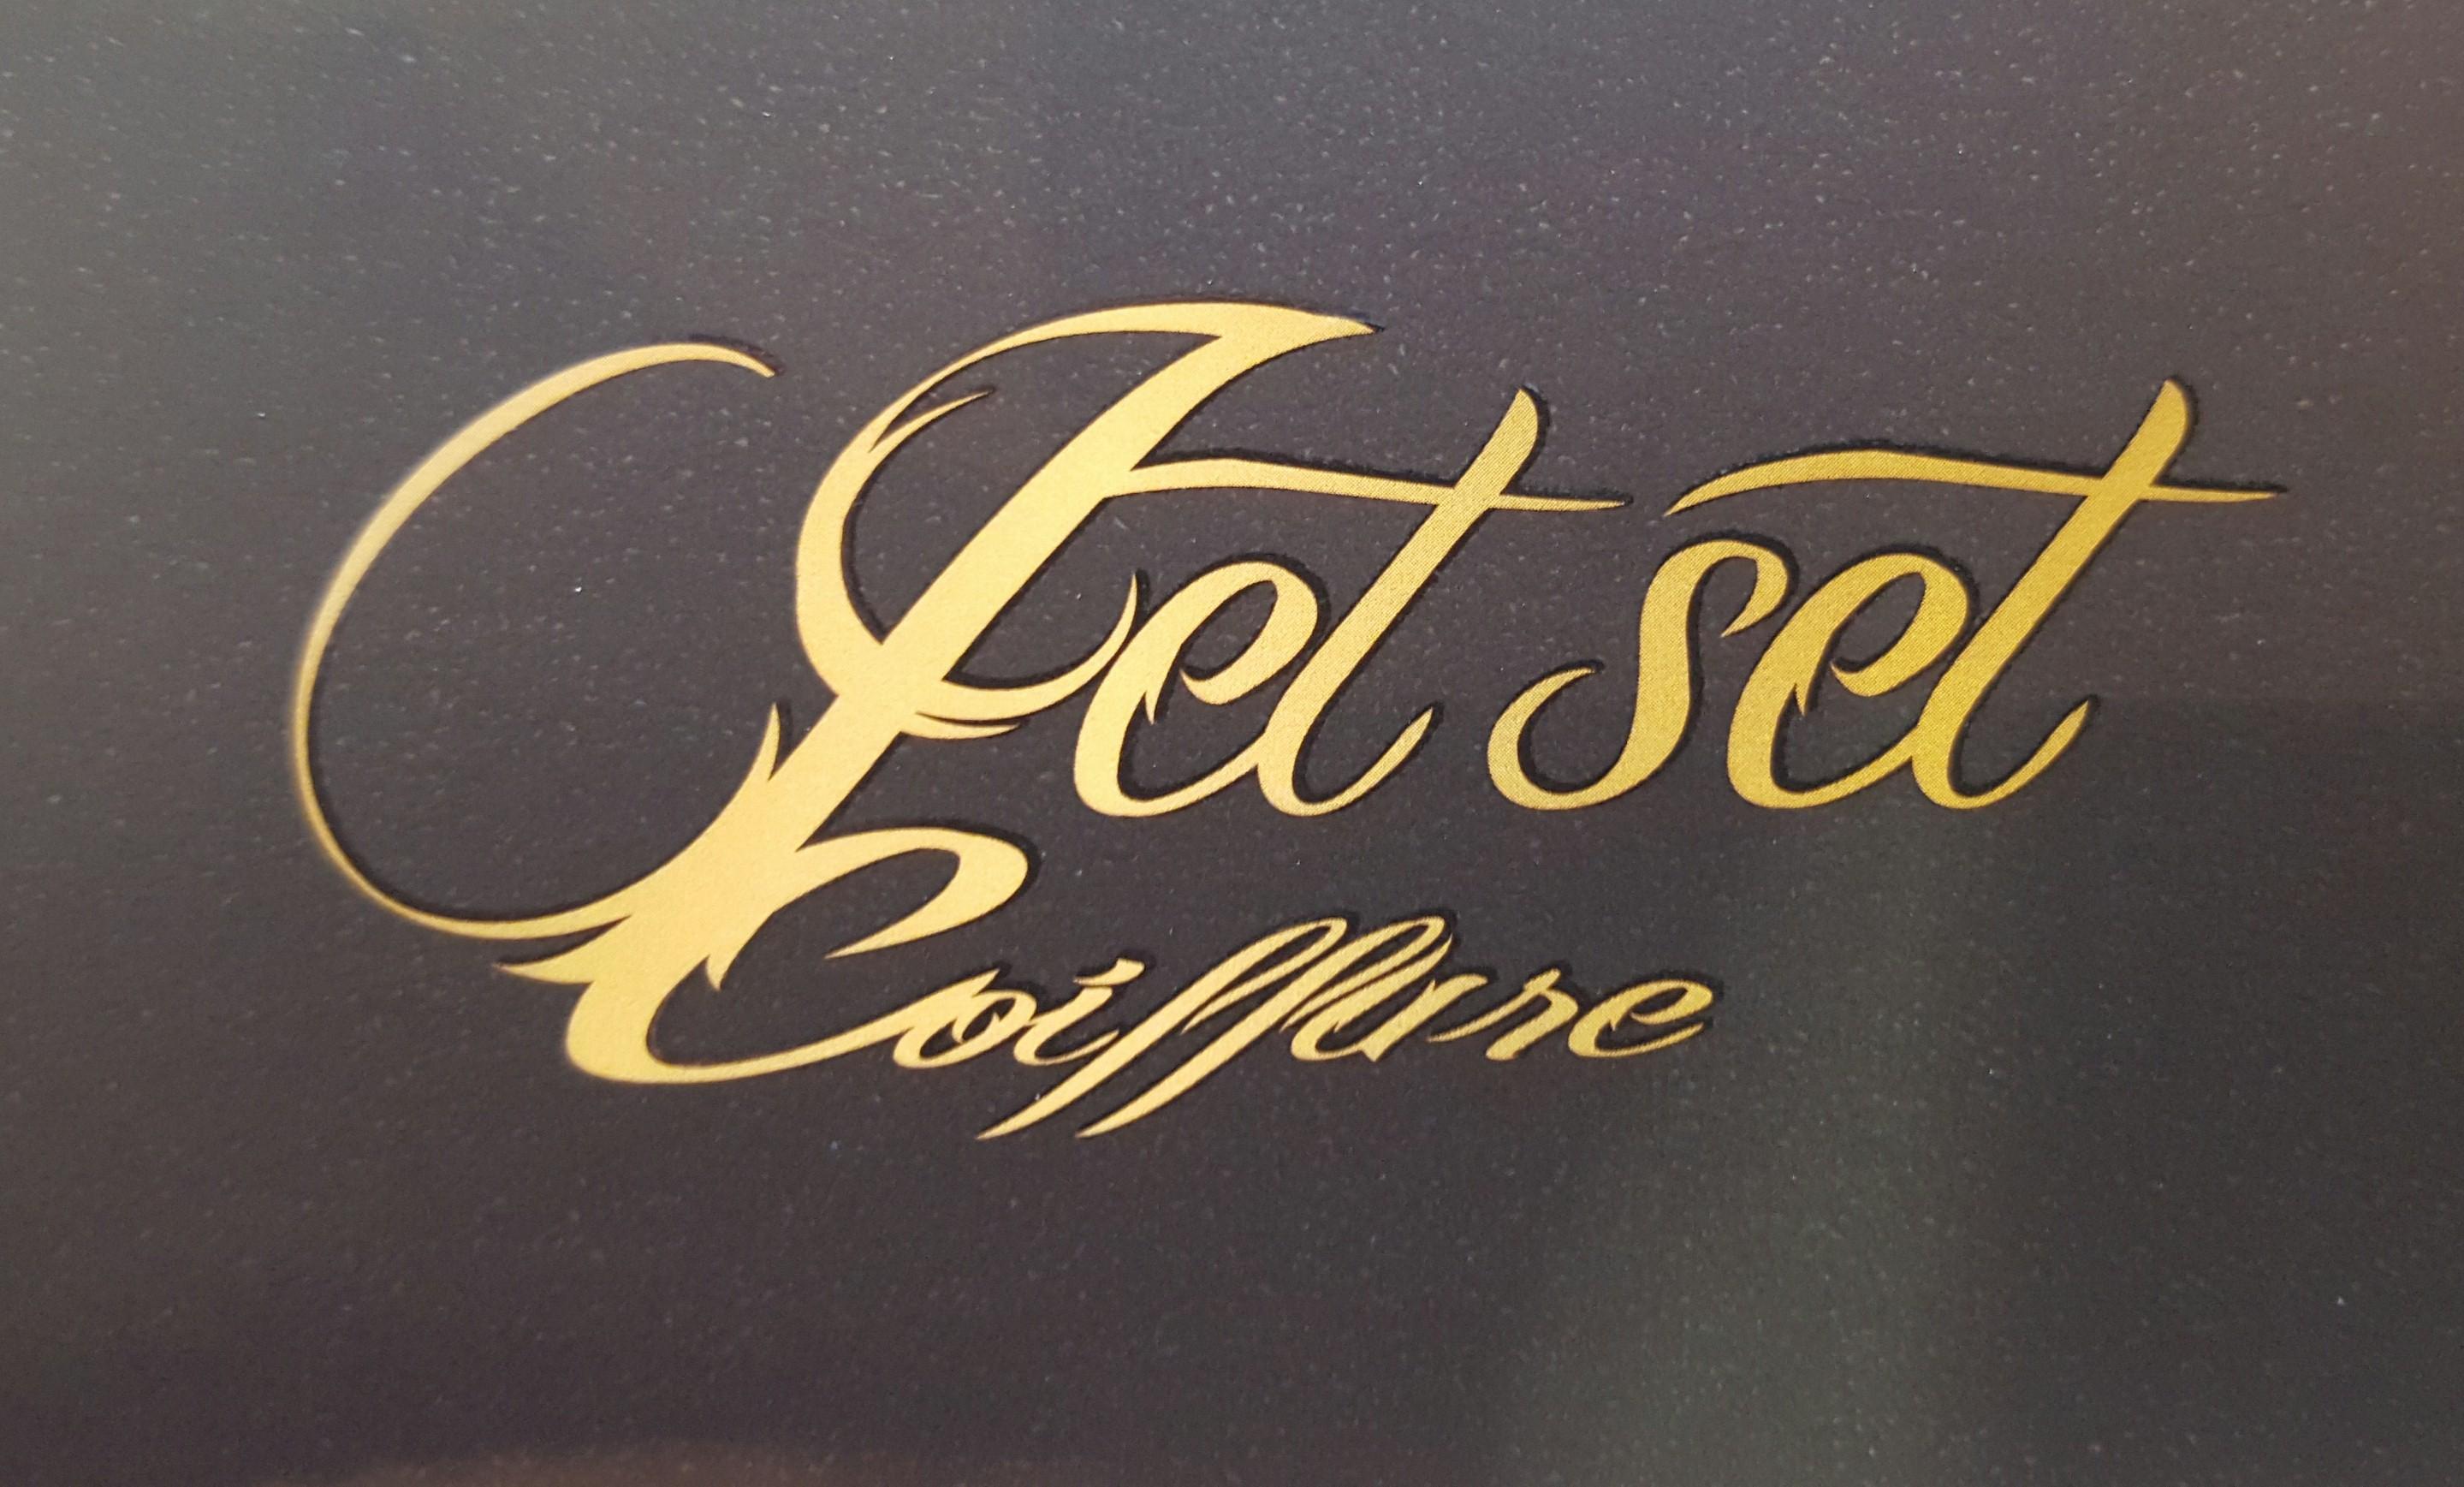 Jet set coiffure boulogne billancourt avis tarifs for Salon de coiffure boulogne billancourt